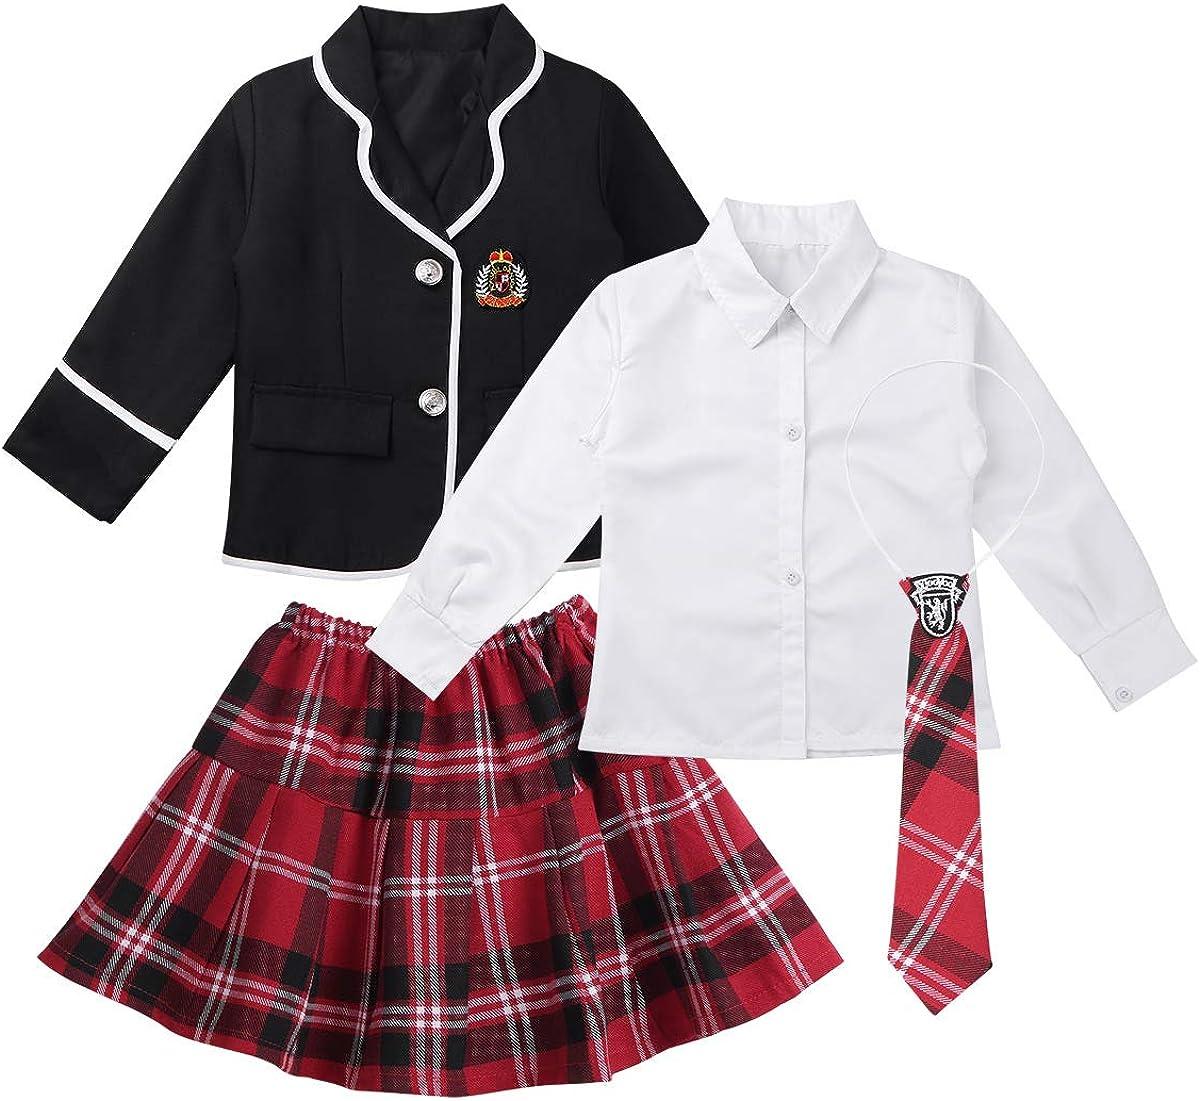 YUUMIN Kids Girls 4PCS British Washington Mall Style Long Sleeves famous Sets with Coat